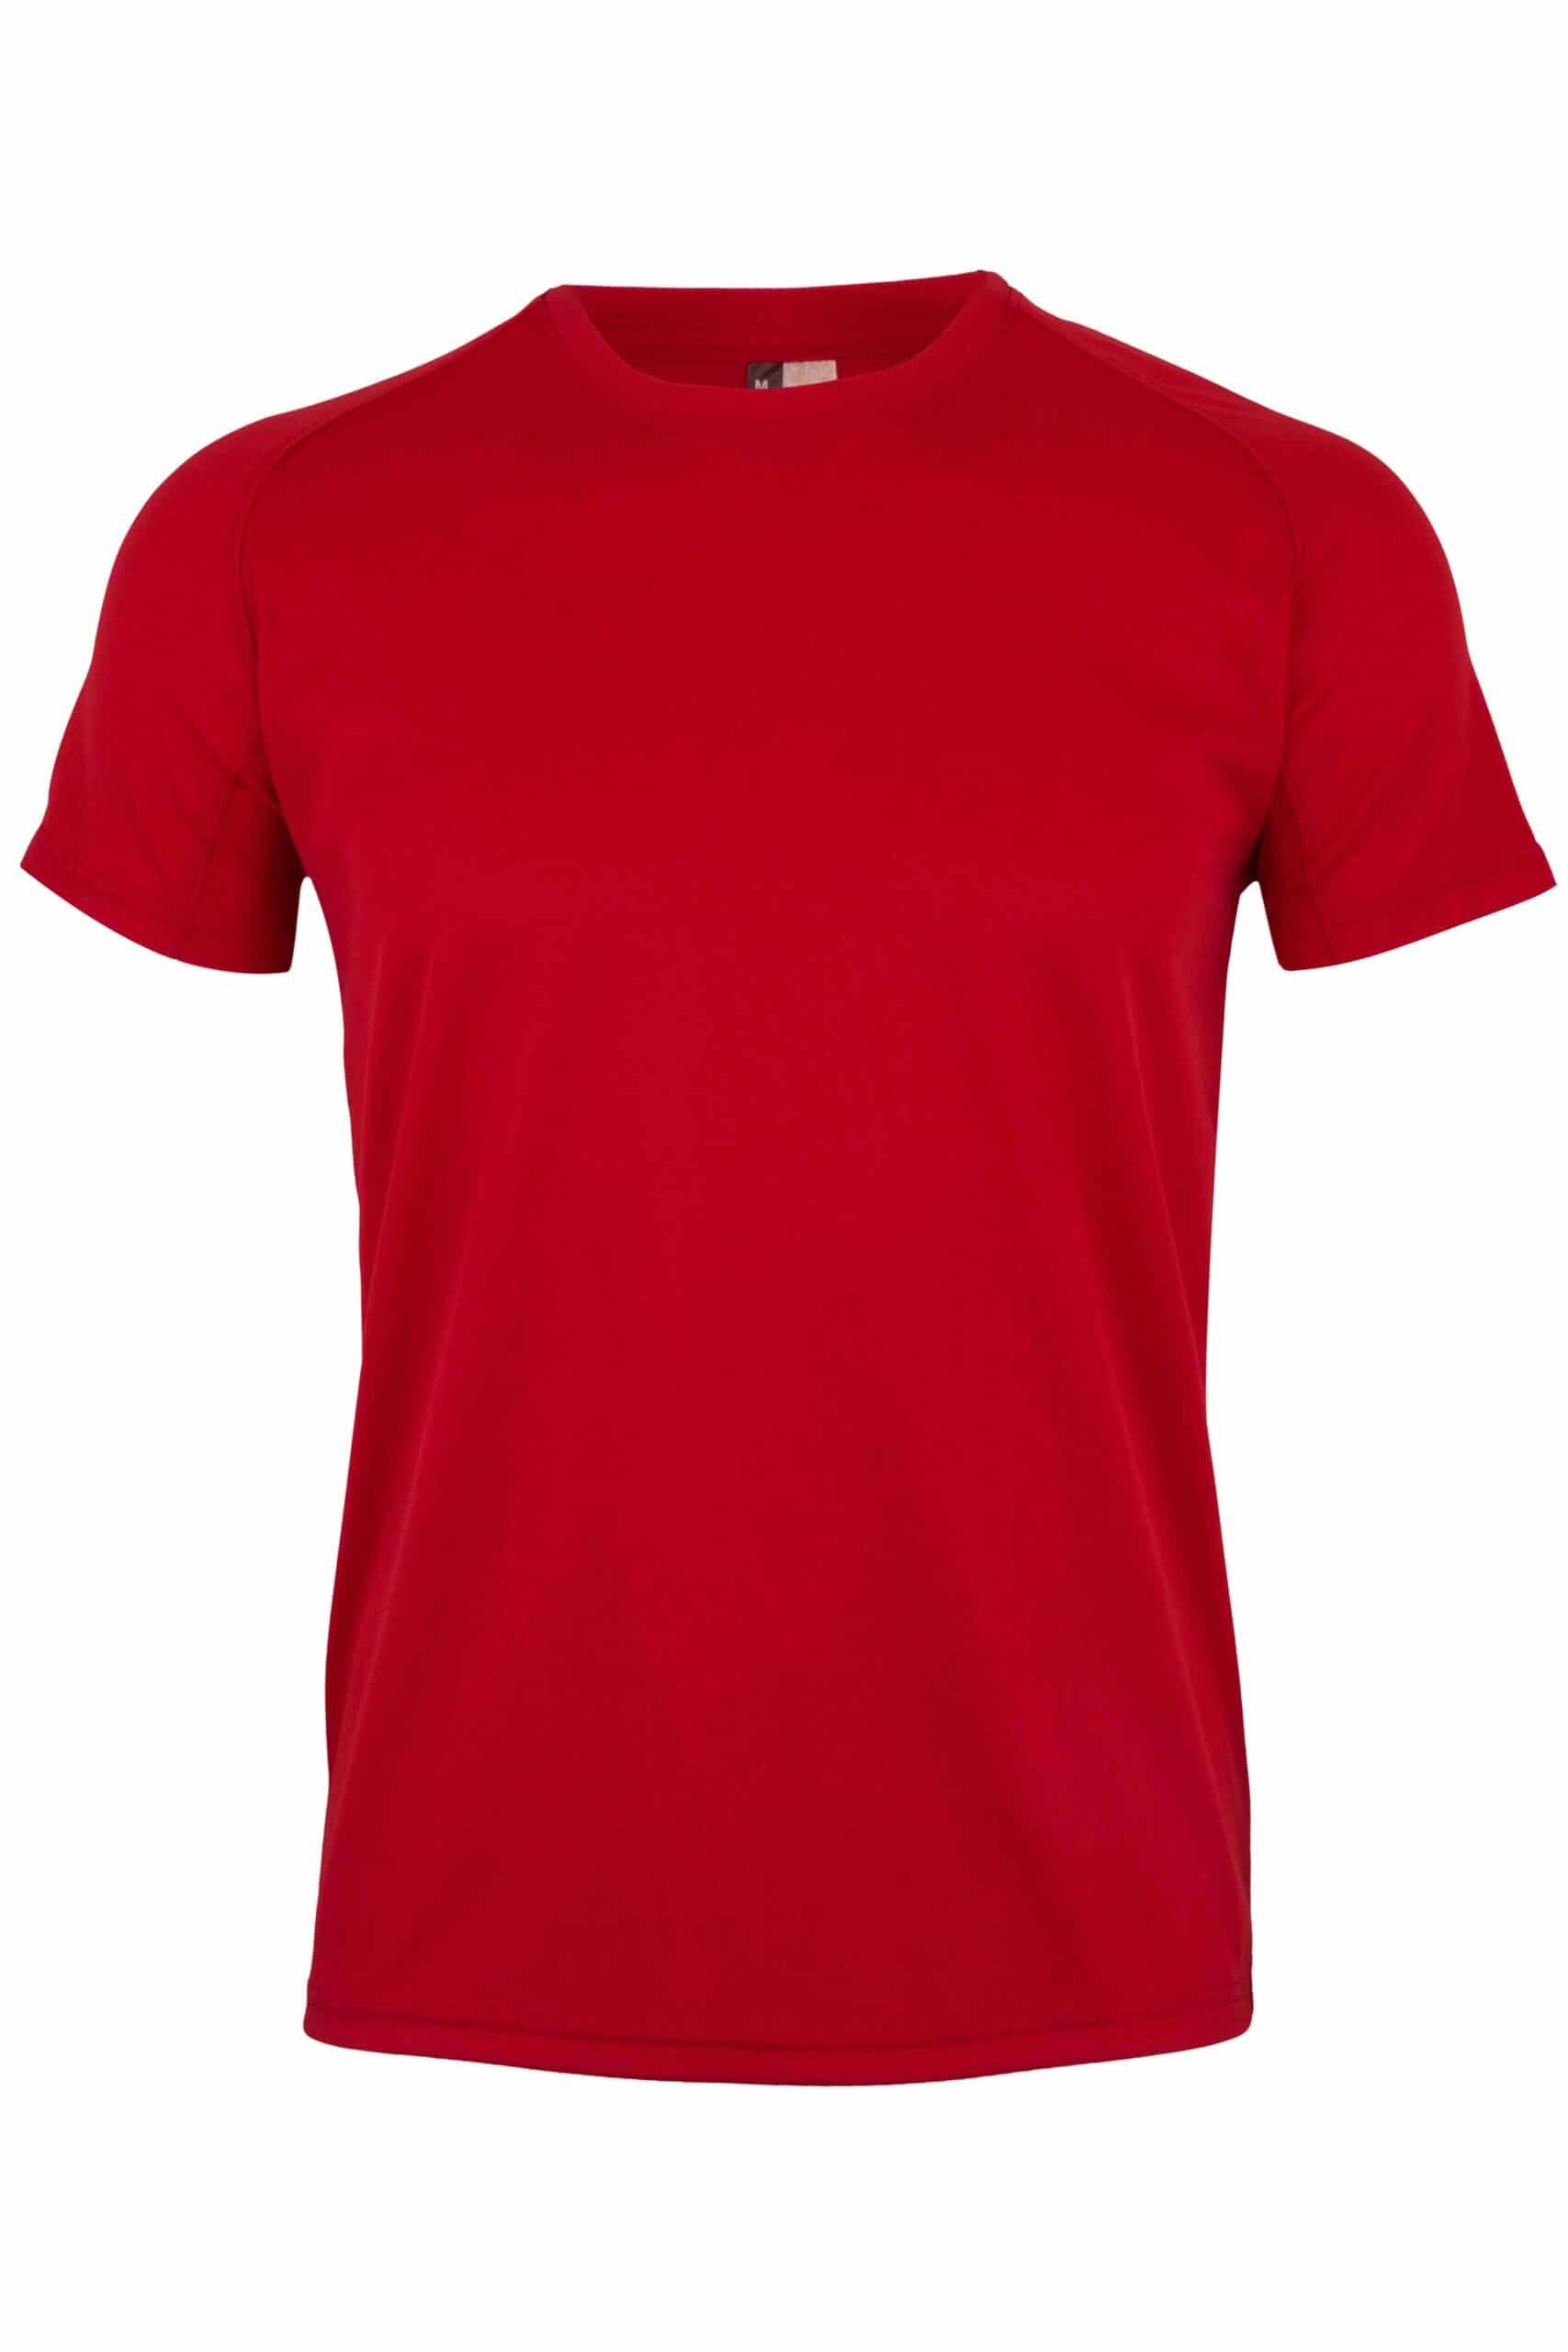 Mukua Mk520v Camiseta TÉcnica Manga Corta Red